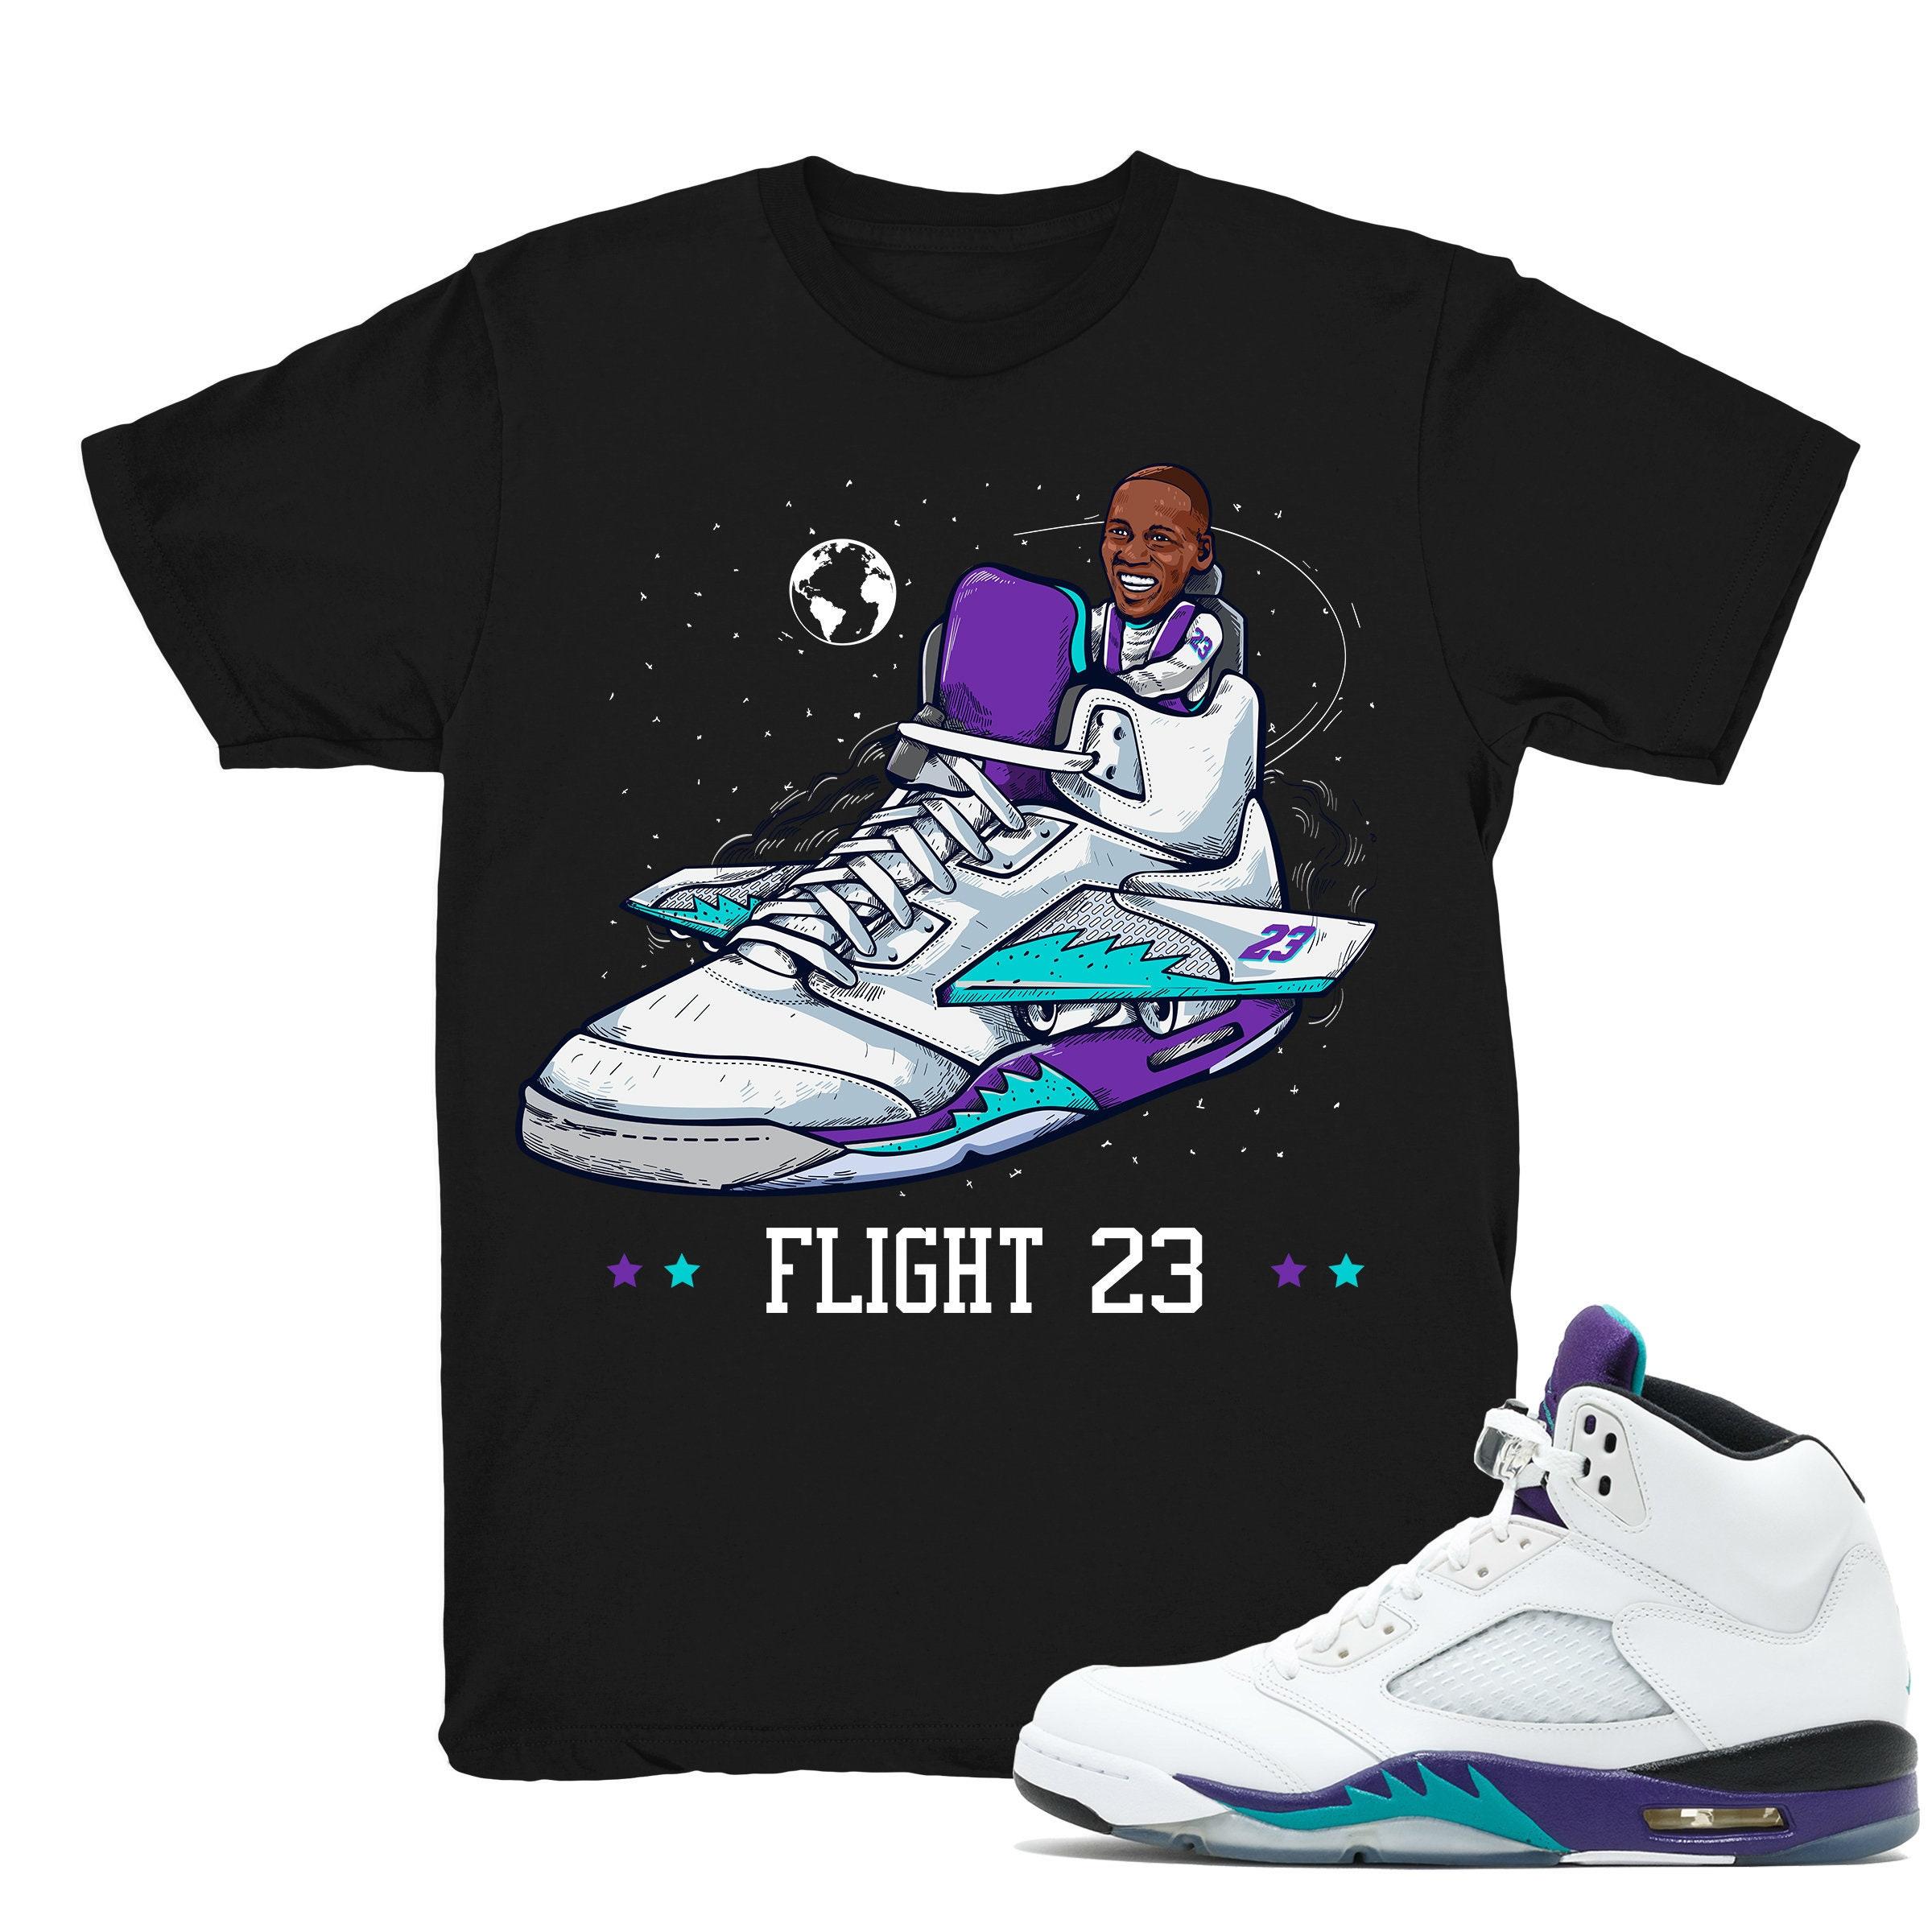 official photos 96ce4 3b2cd Air Jordan 5 Grape shirt | Flight 23 - Retro 5 Fresh Prince Grape Black tee  shirts